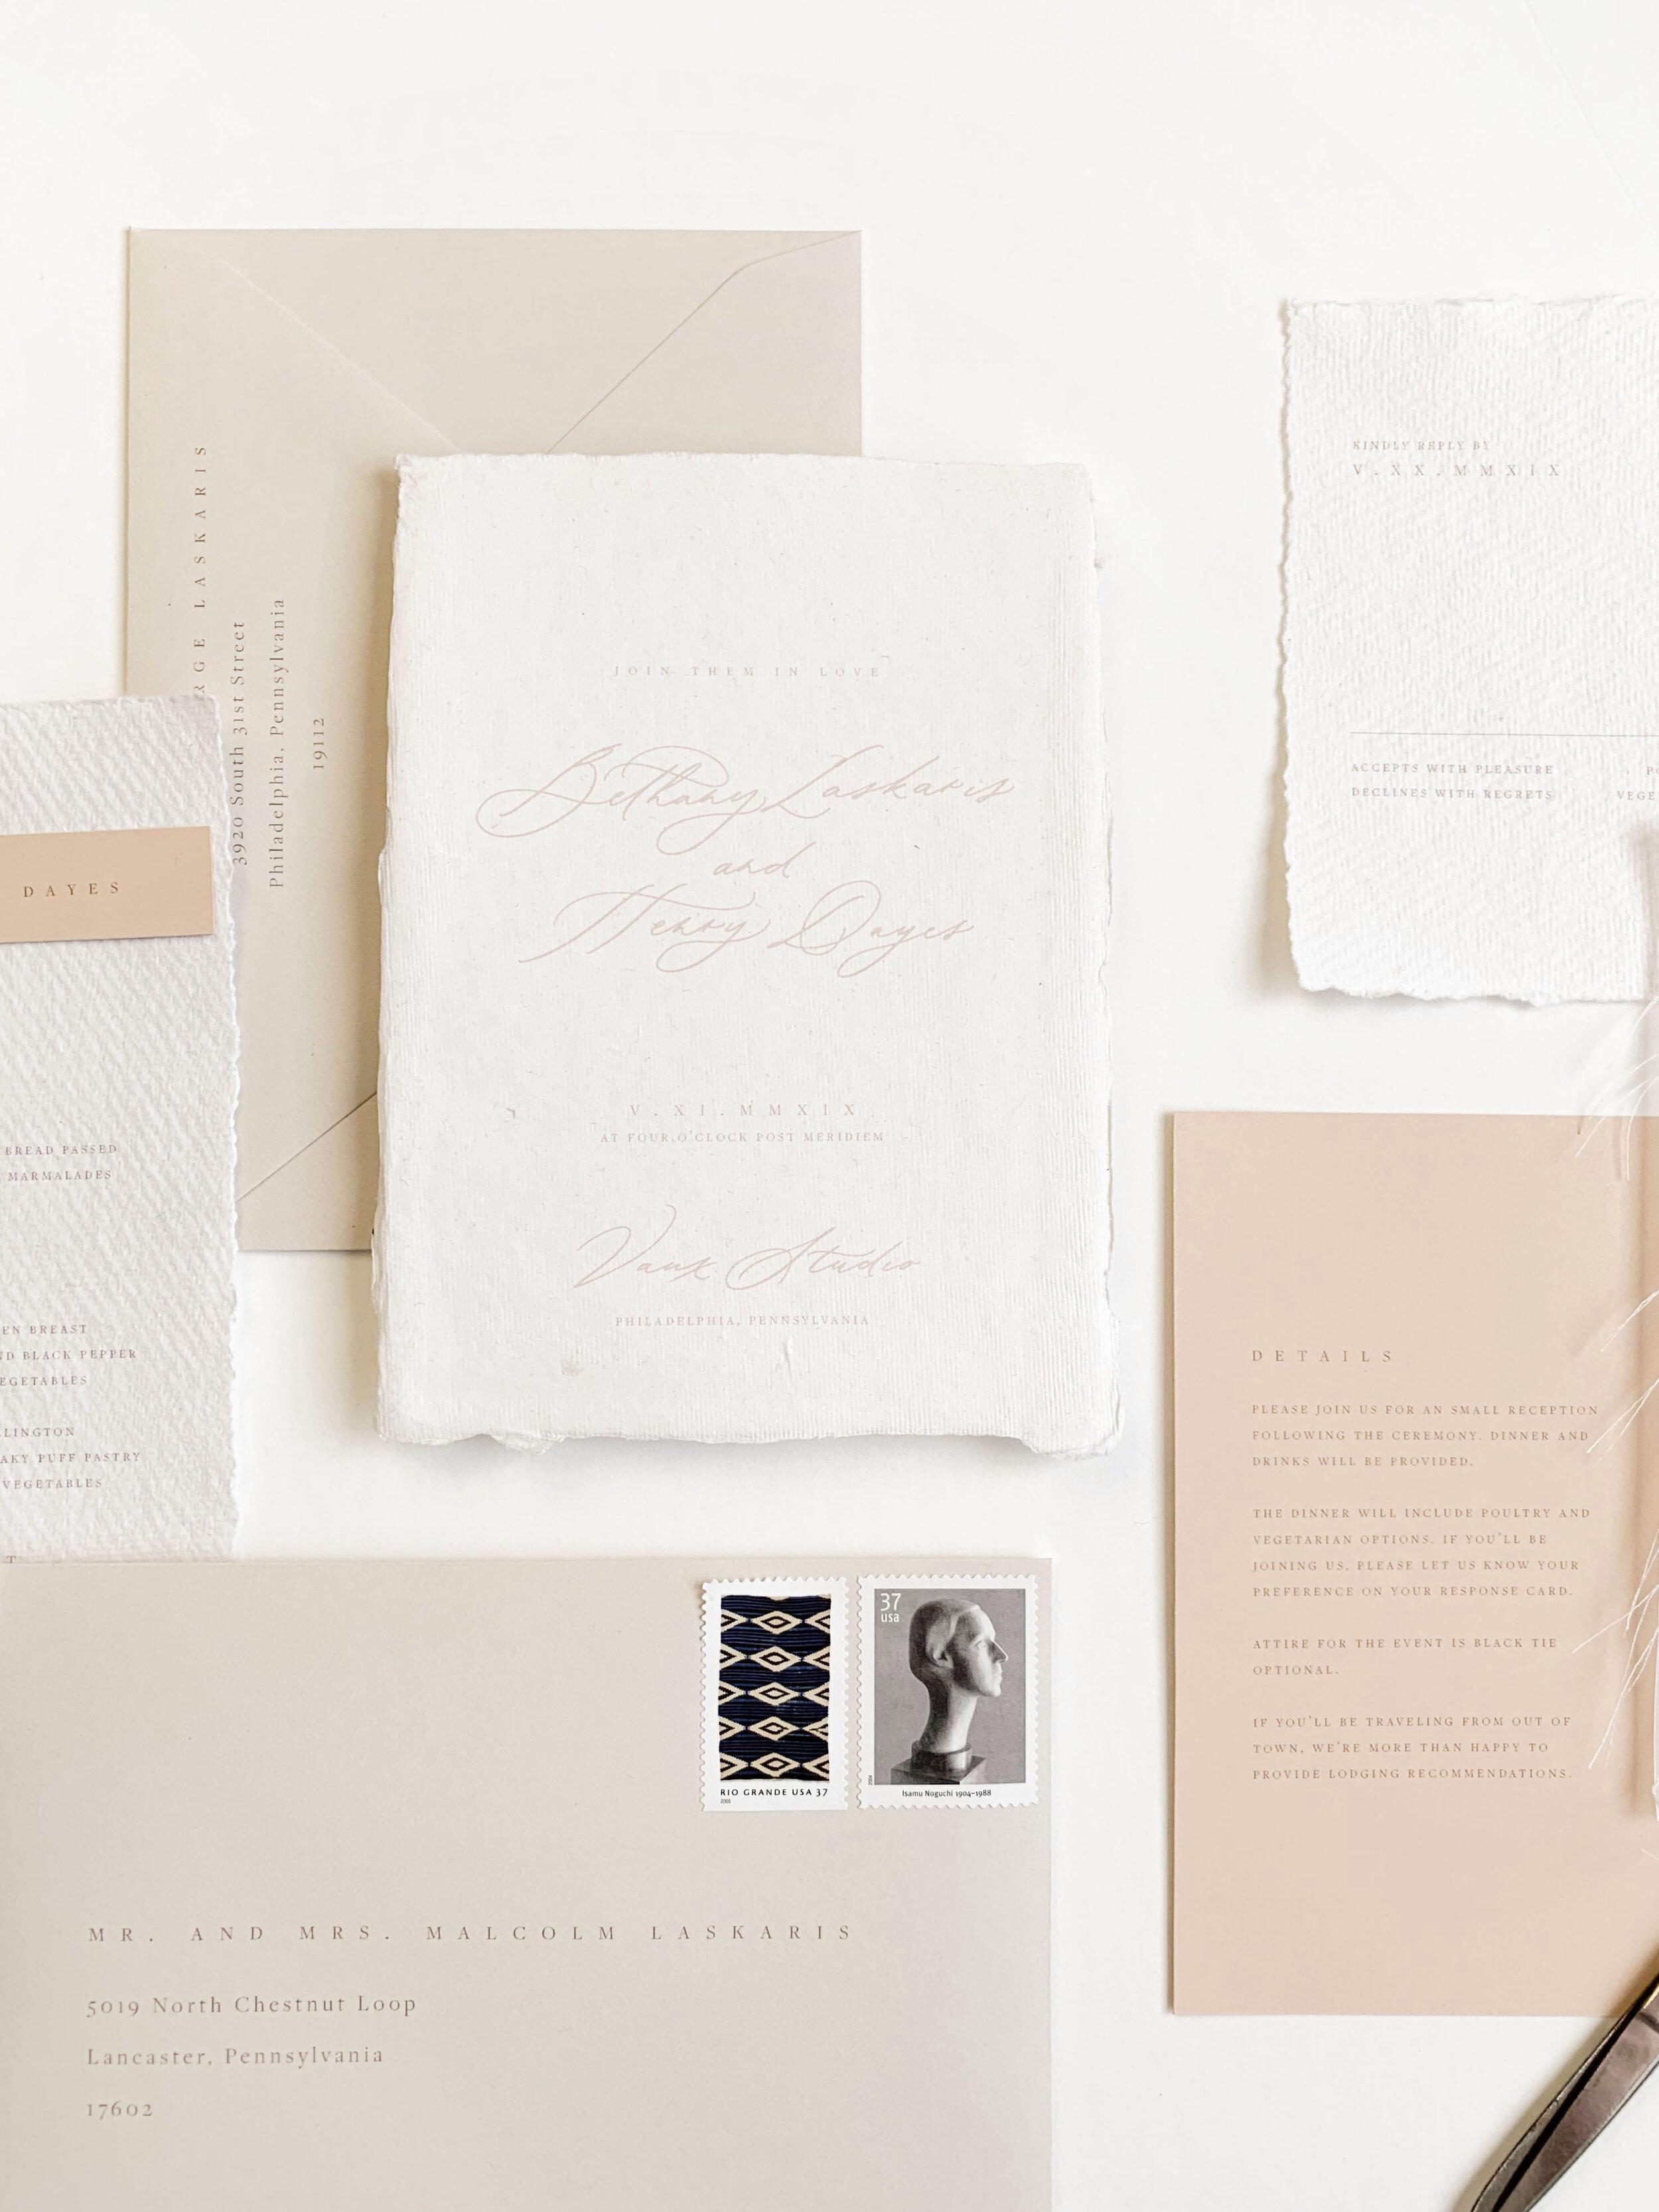 Modern minimalist wedding invitations. Vellum wedding invitations. Calligraphy wedding vintage postage invitations. Wedding invitation suite. Wedding menus. Neutral wedding invitations. Peach wedding invitations. Coral wedding invitations.